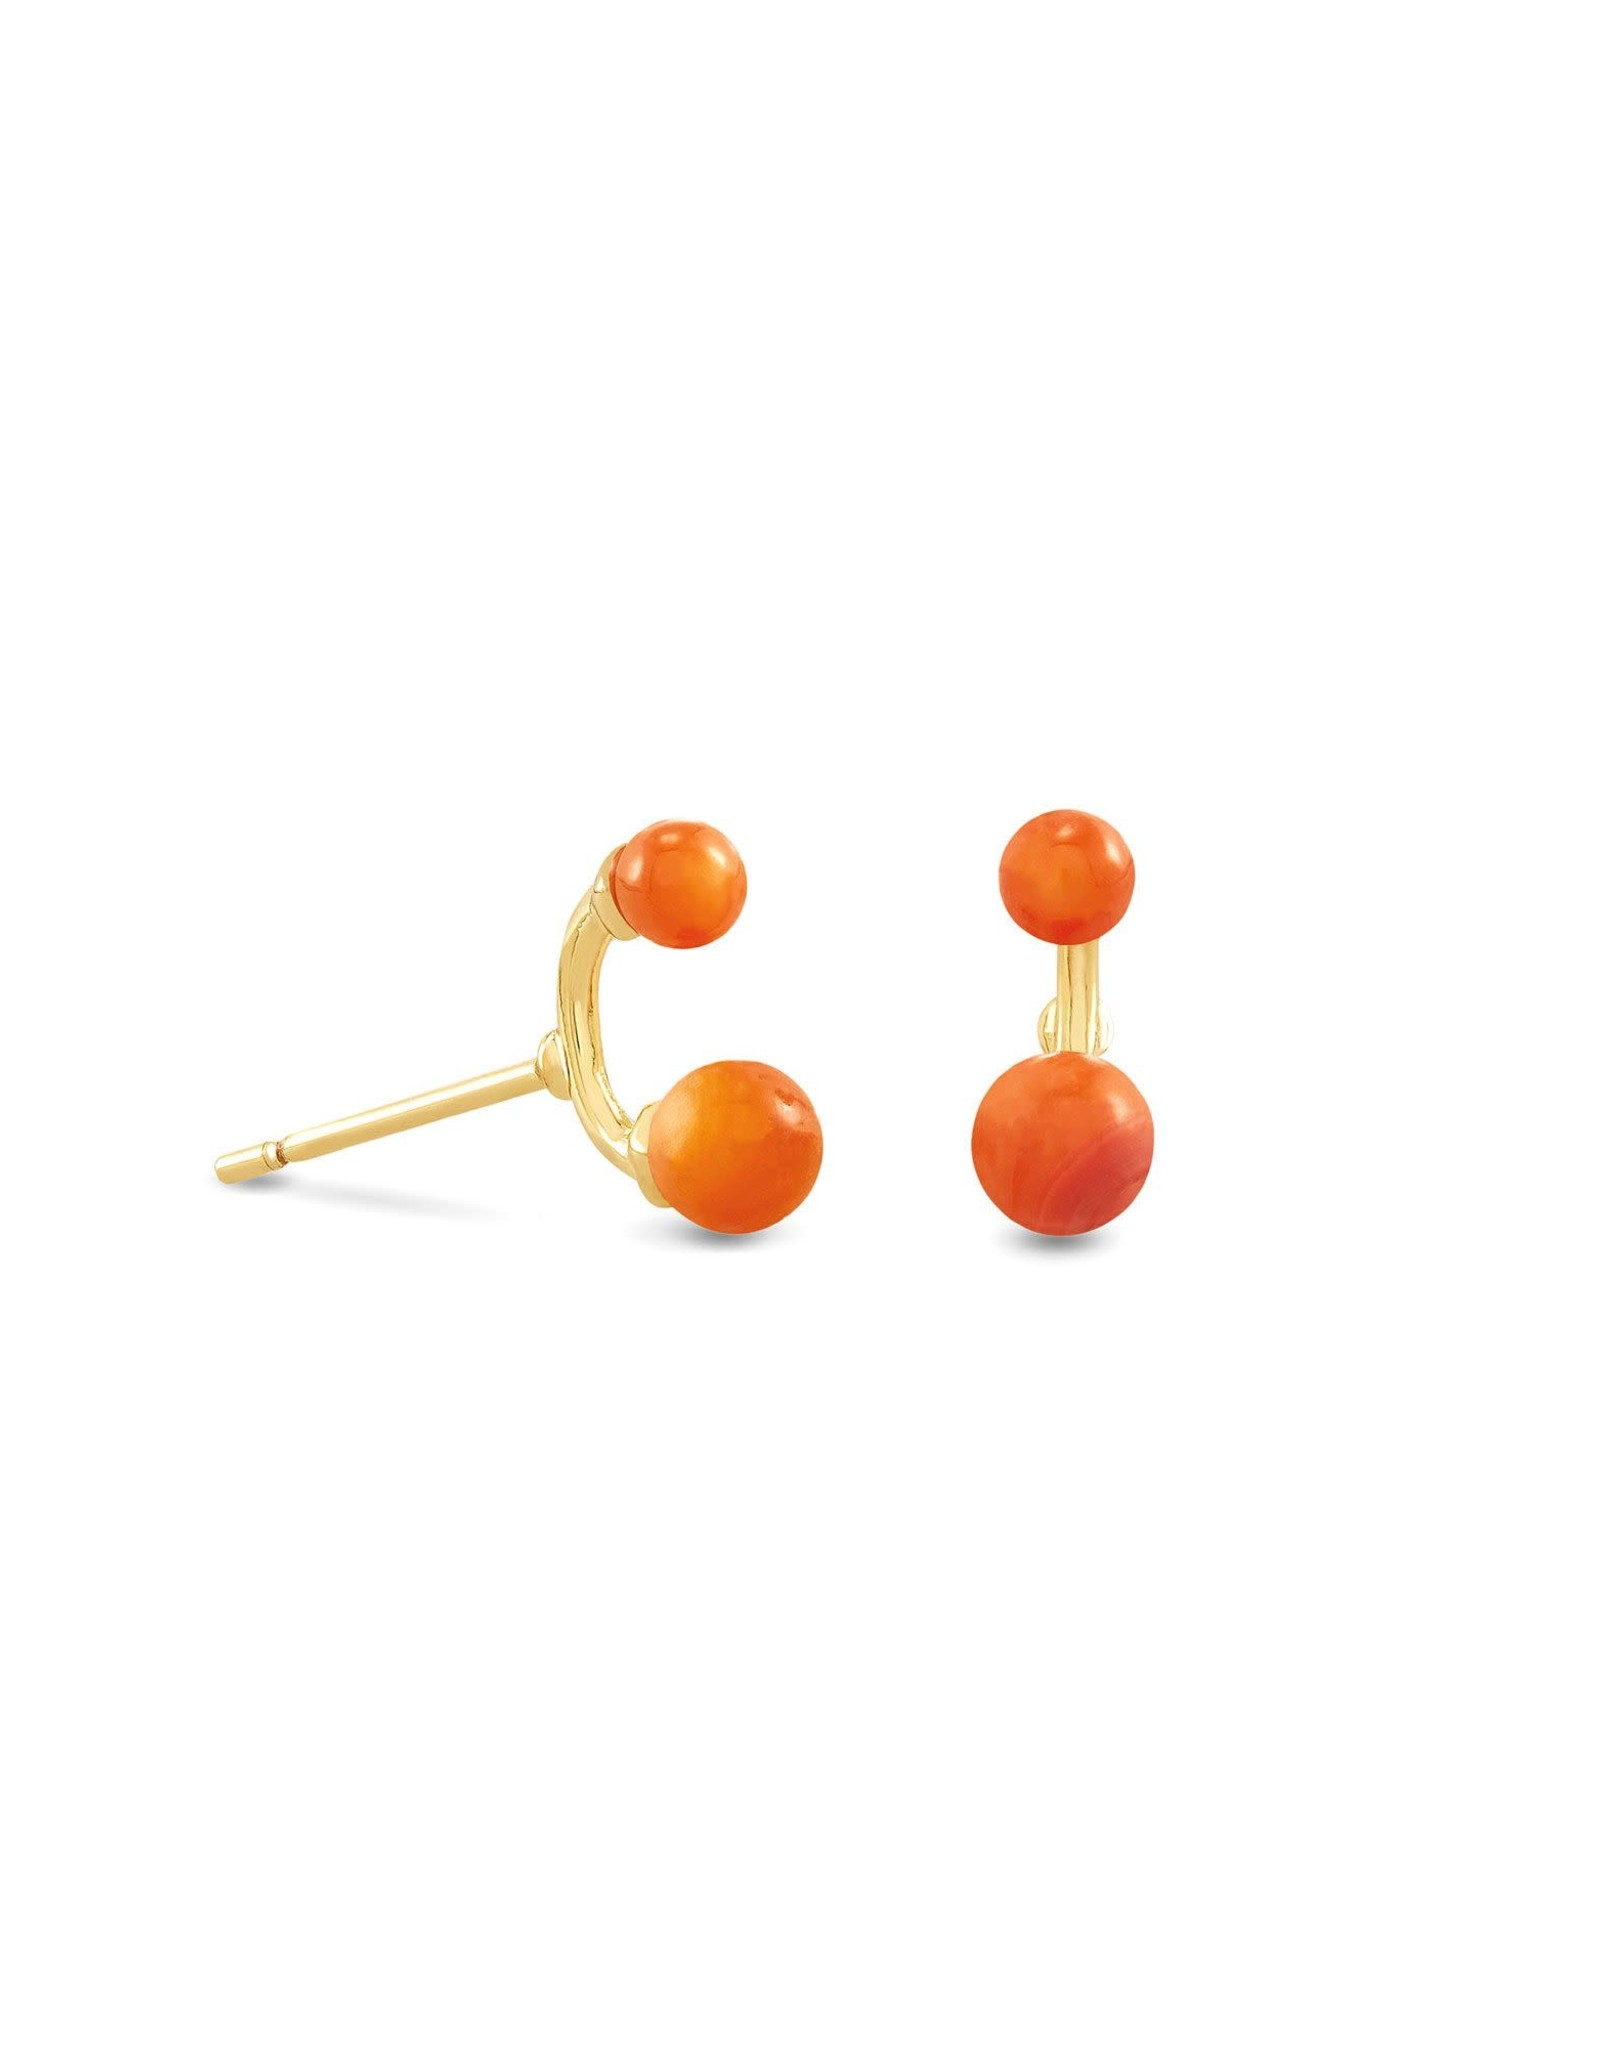 Kendra Scott Demi Stud Earring - Papaya Mother of Pearl/Gold